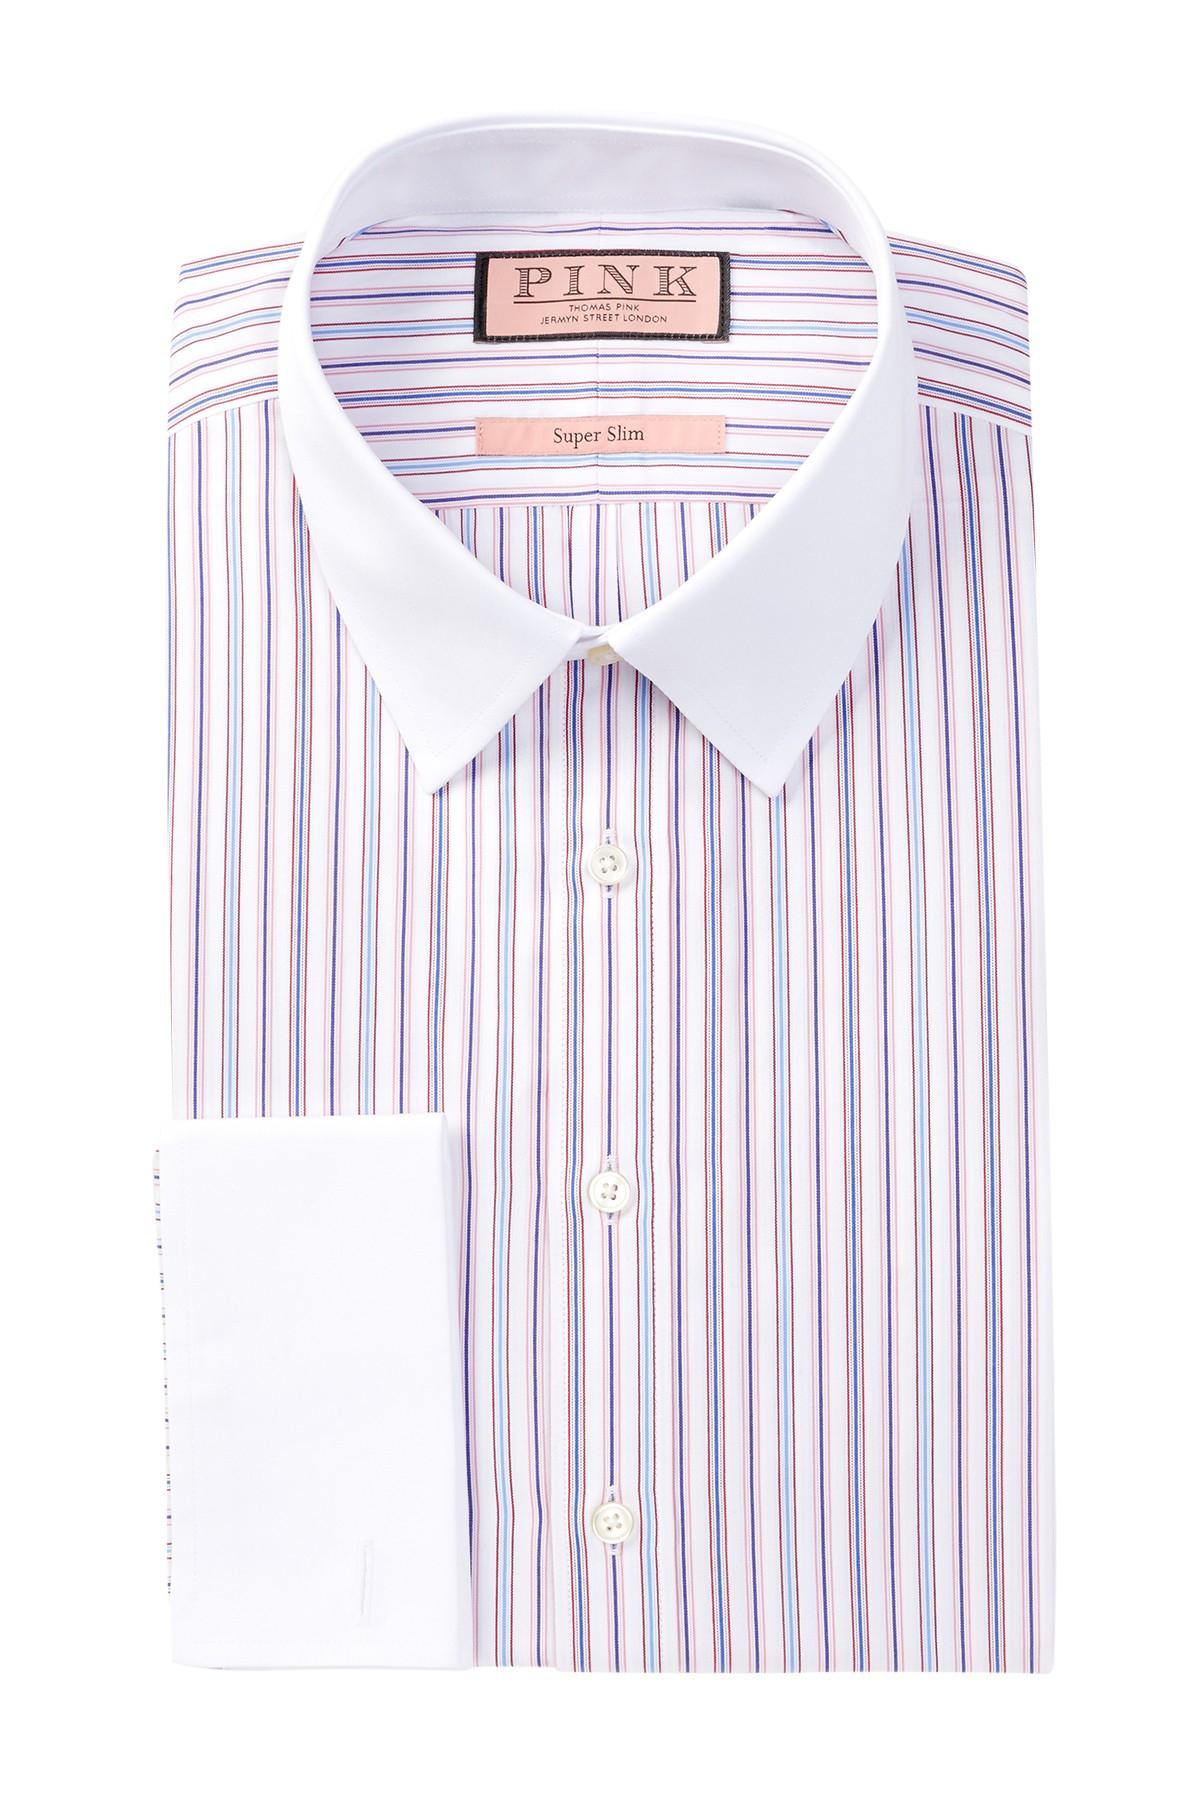 Thomas Pink Hedley Long Sleeve Super Slim Fit Dress Shirt